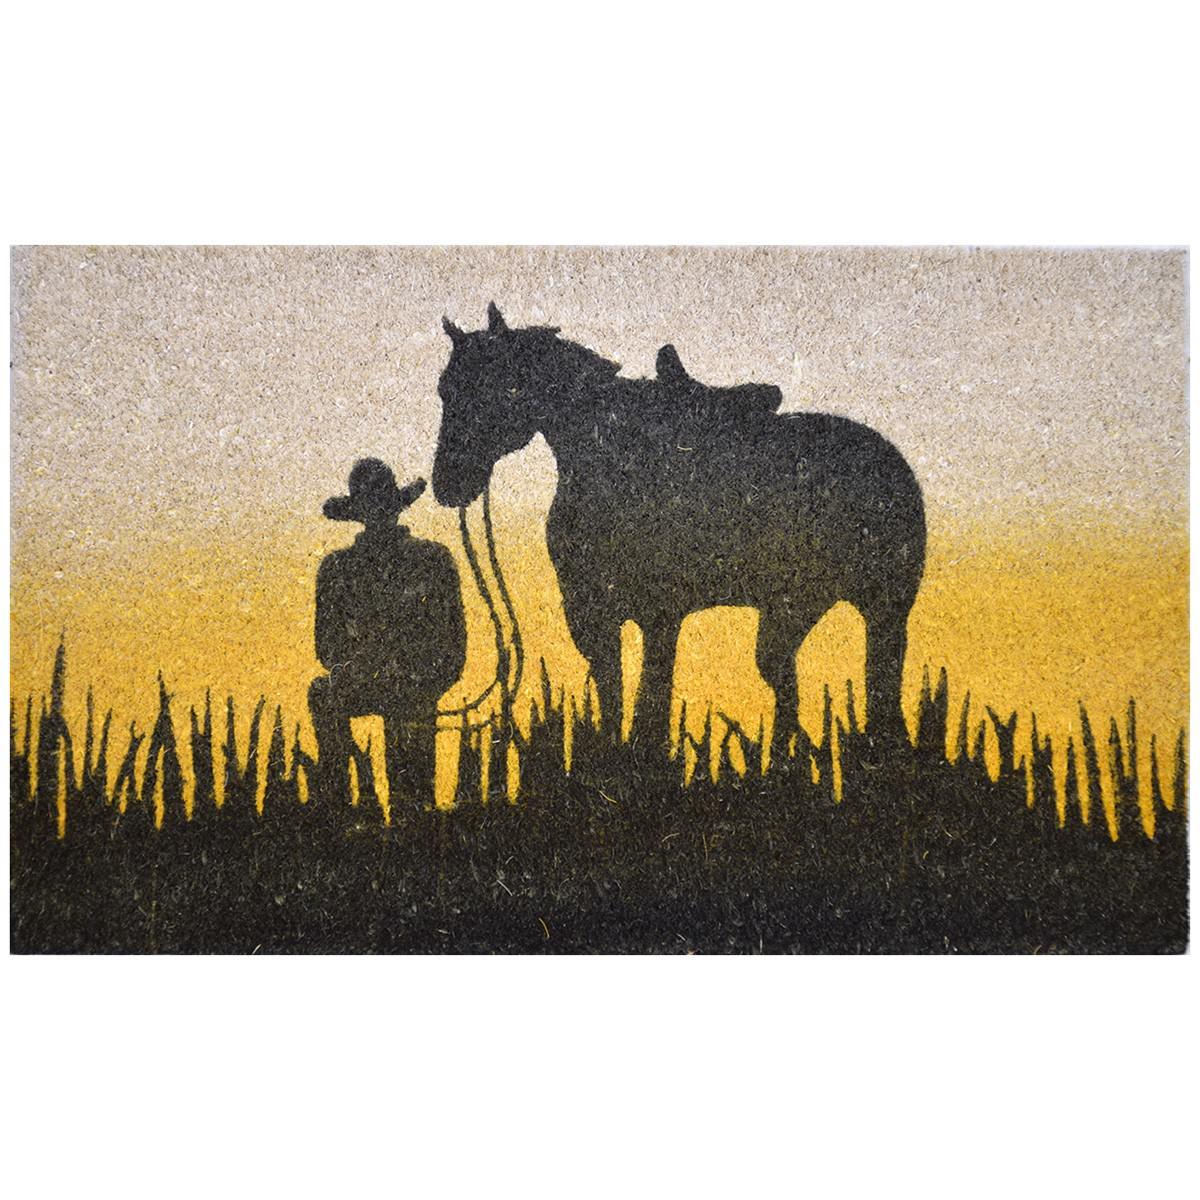 Horse Silhouette Coir Doormat, 75x45cm